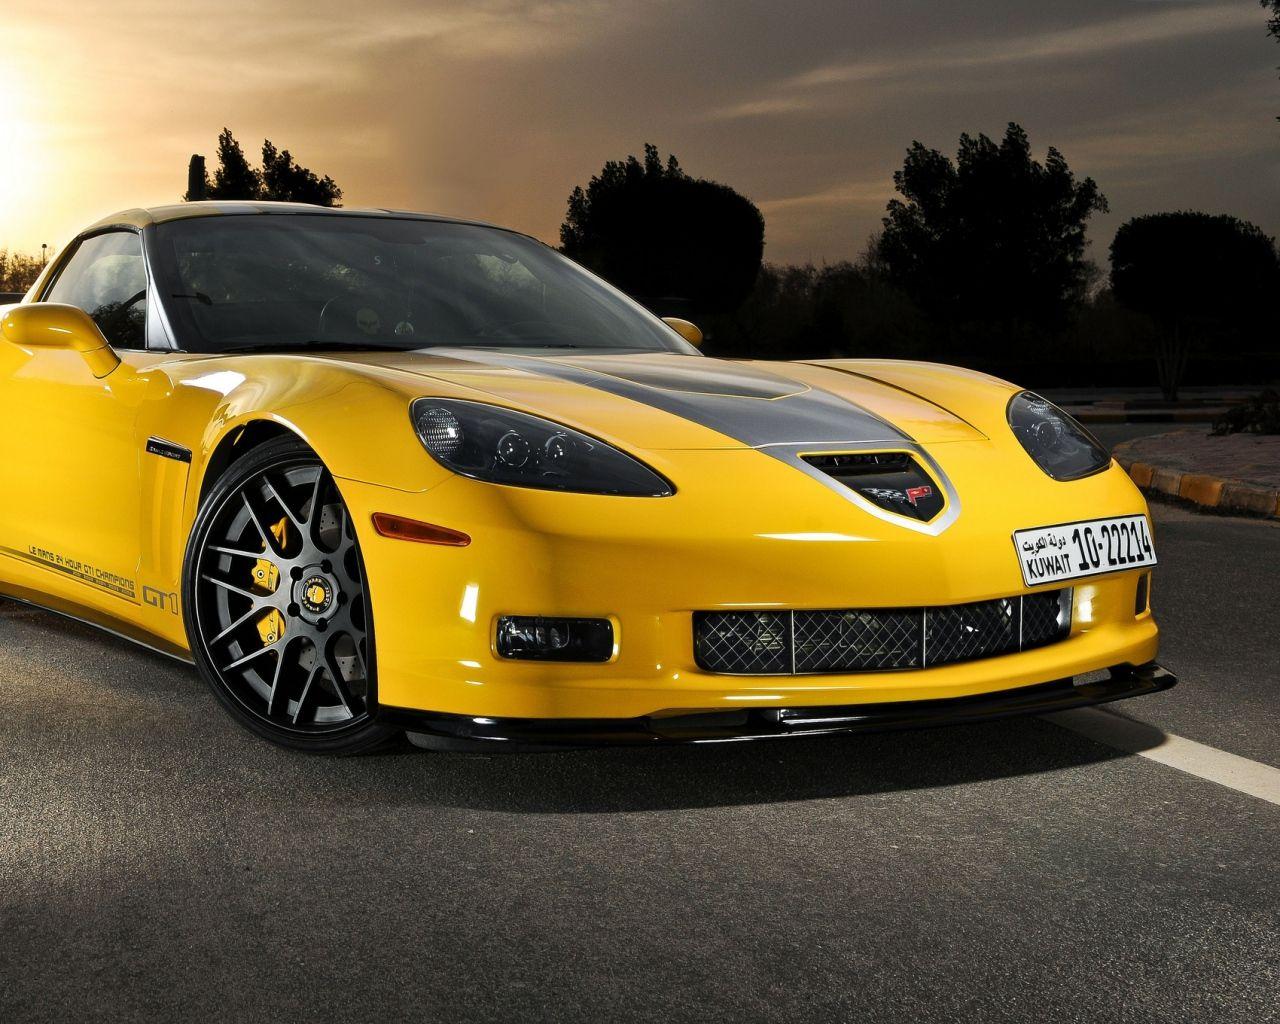 Download Wallpaper 1280x1024 Chevrolet, Corvette, C6